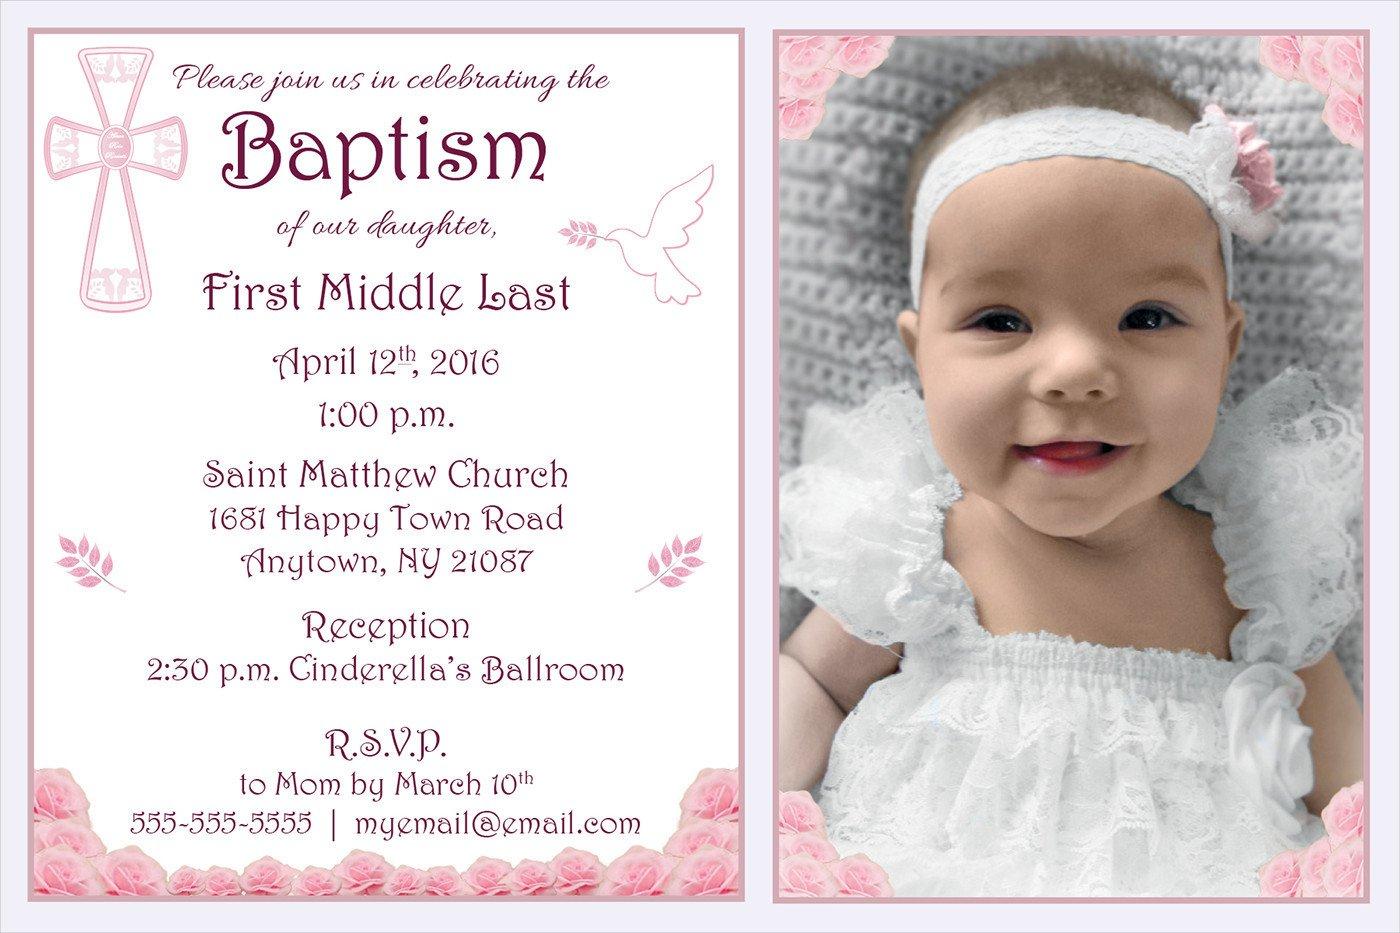 Free Baptism Invitation Templates 10 Baptism Invitation Templates